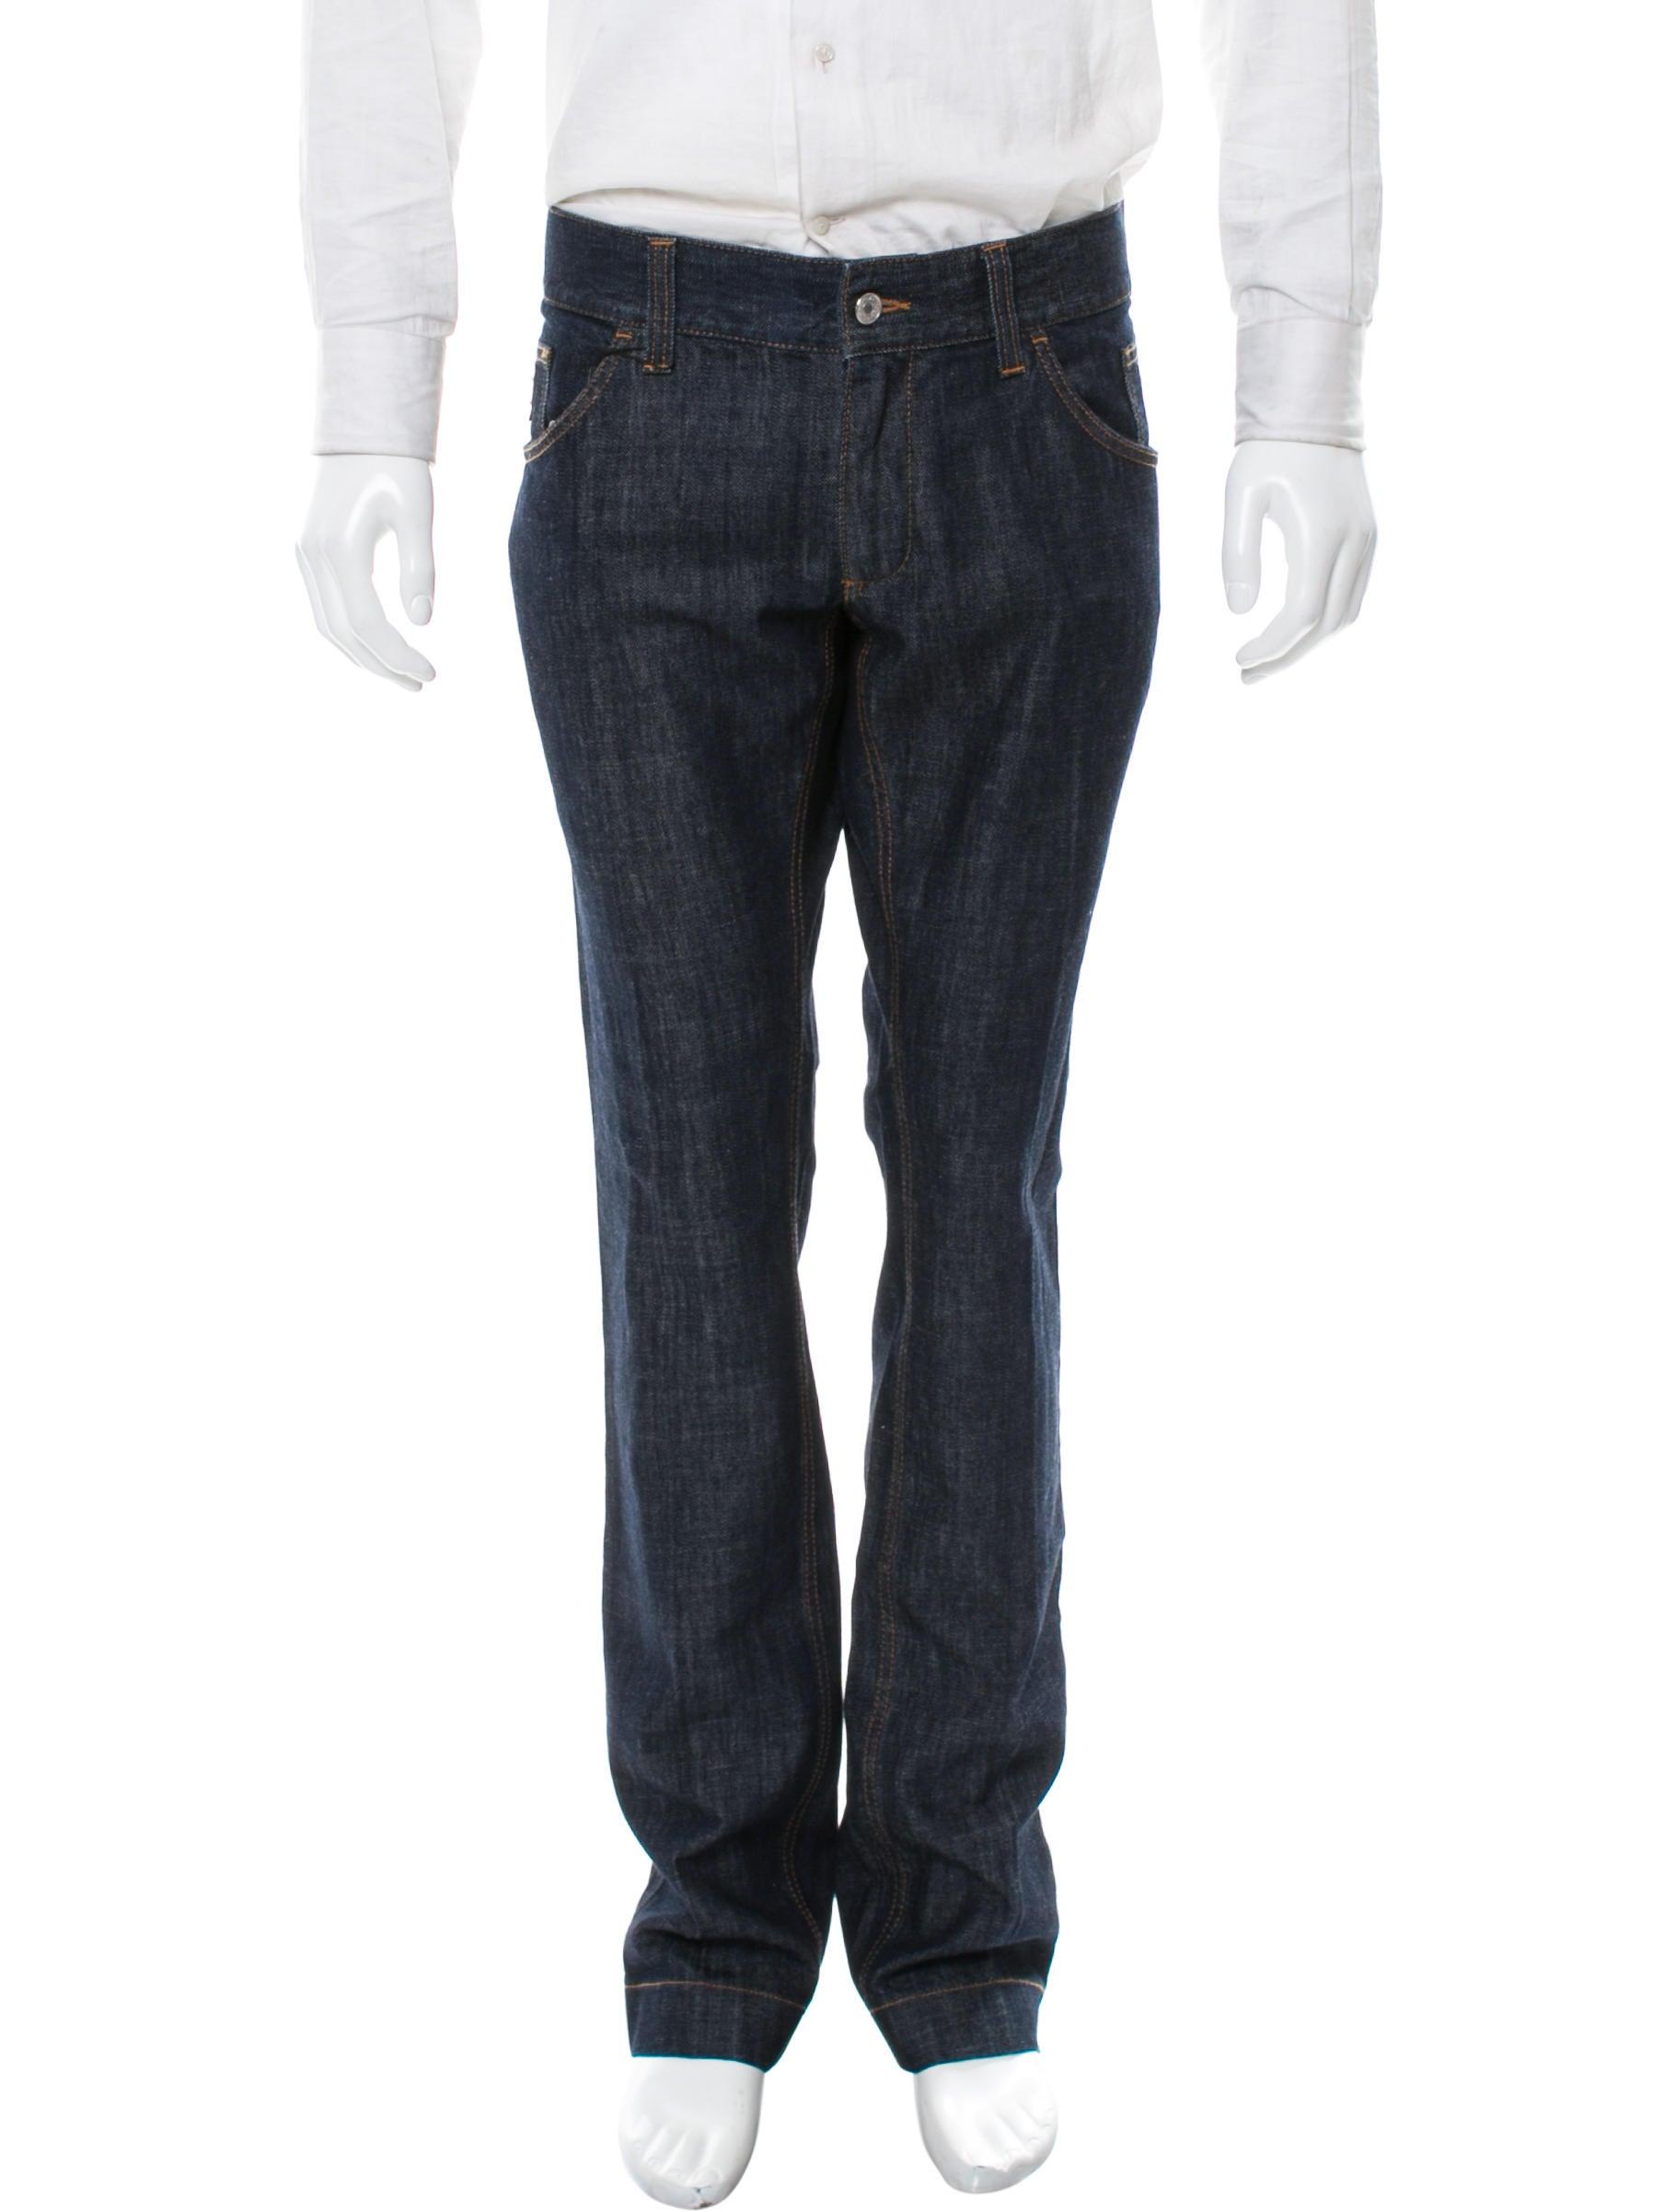 dolce gabbana skinny jeans w tags clothing dag83535. Black Bedroom Furniture Sets. Home Design Ideas